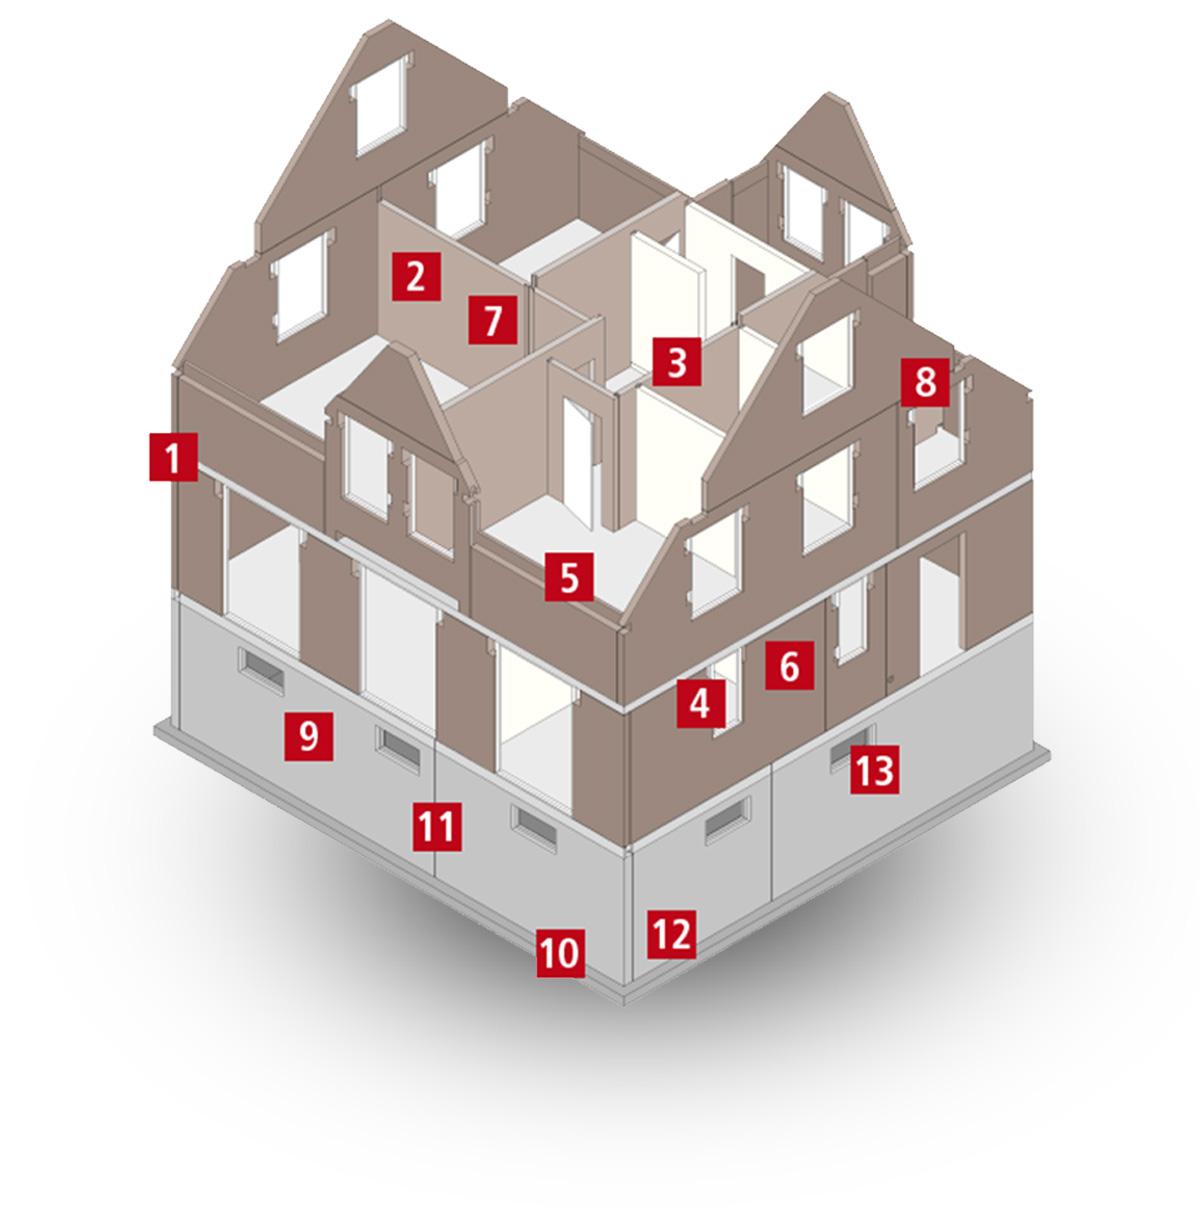 Isometrie eines Rohbausystems